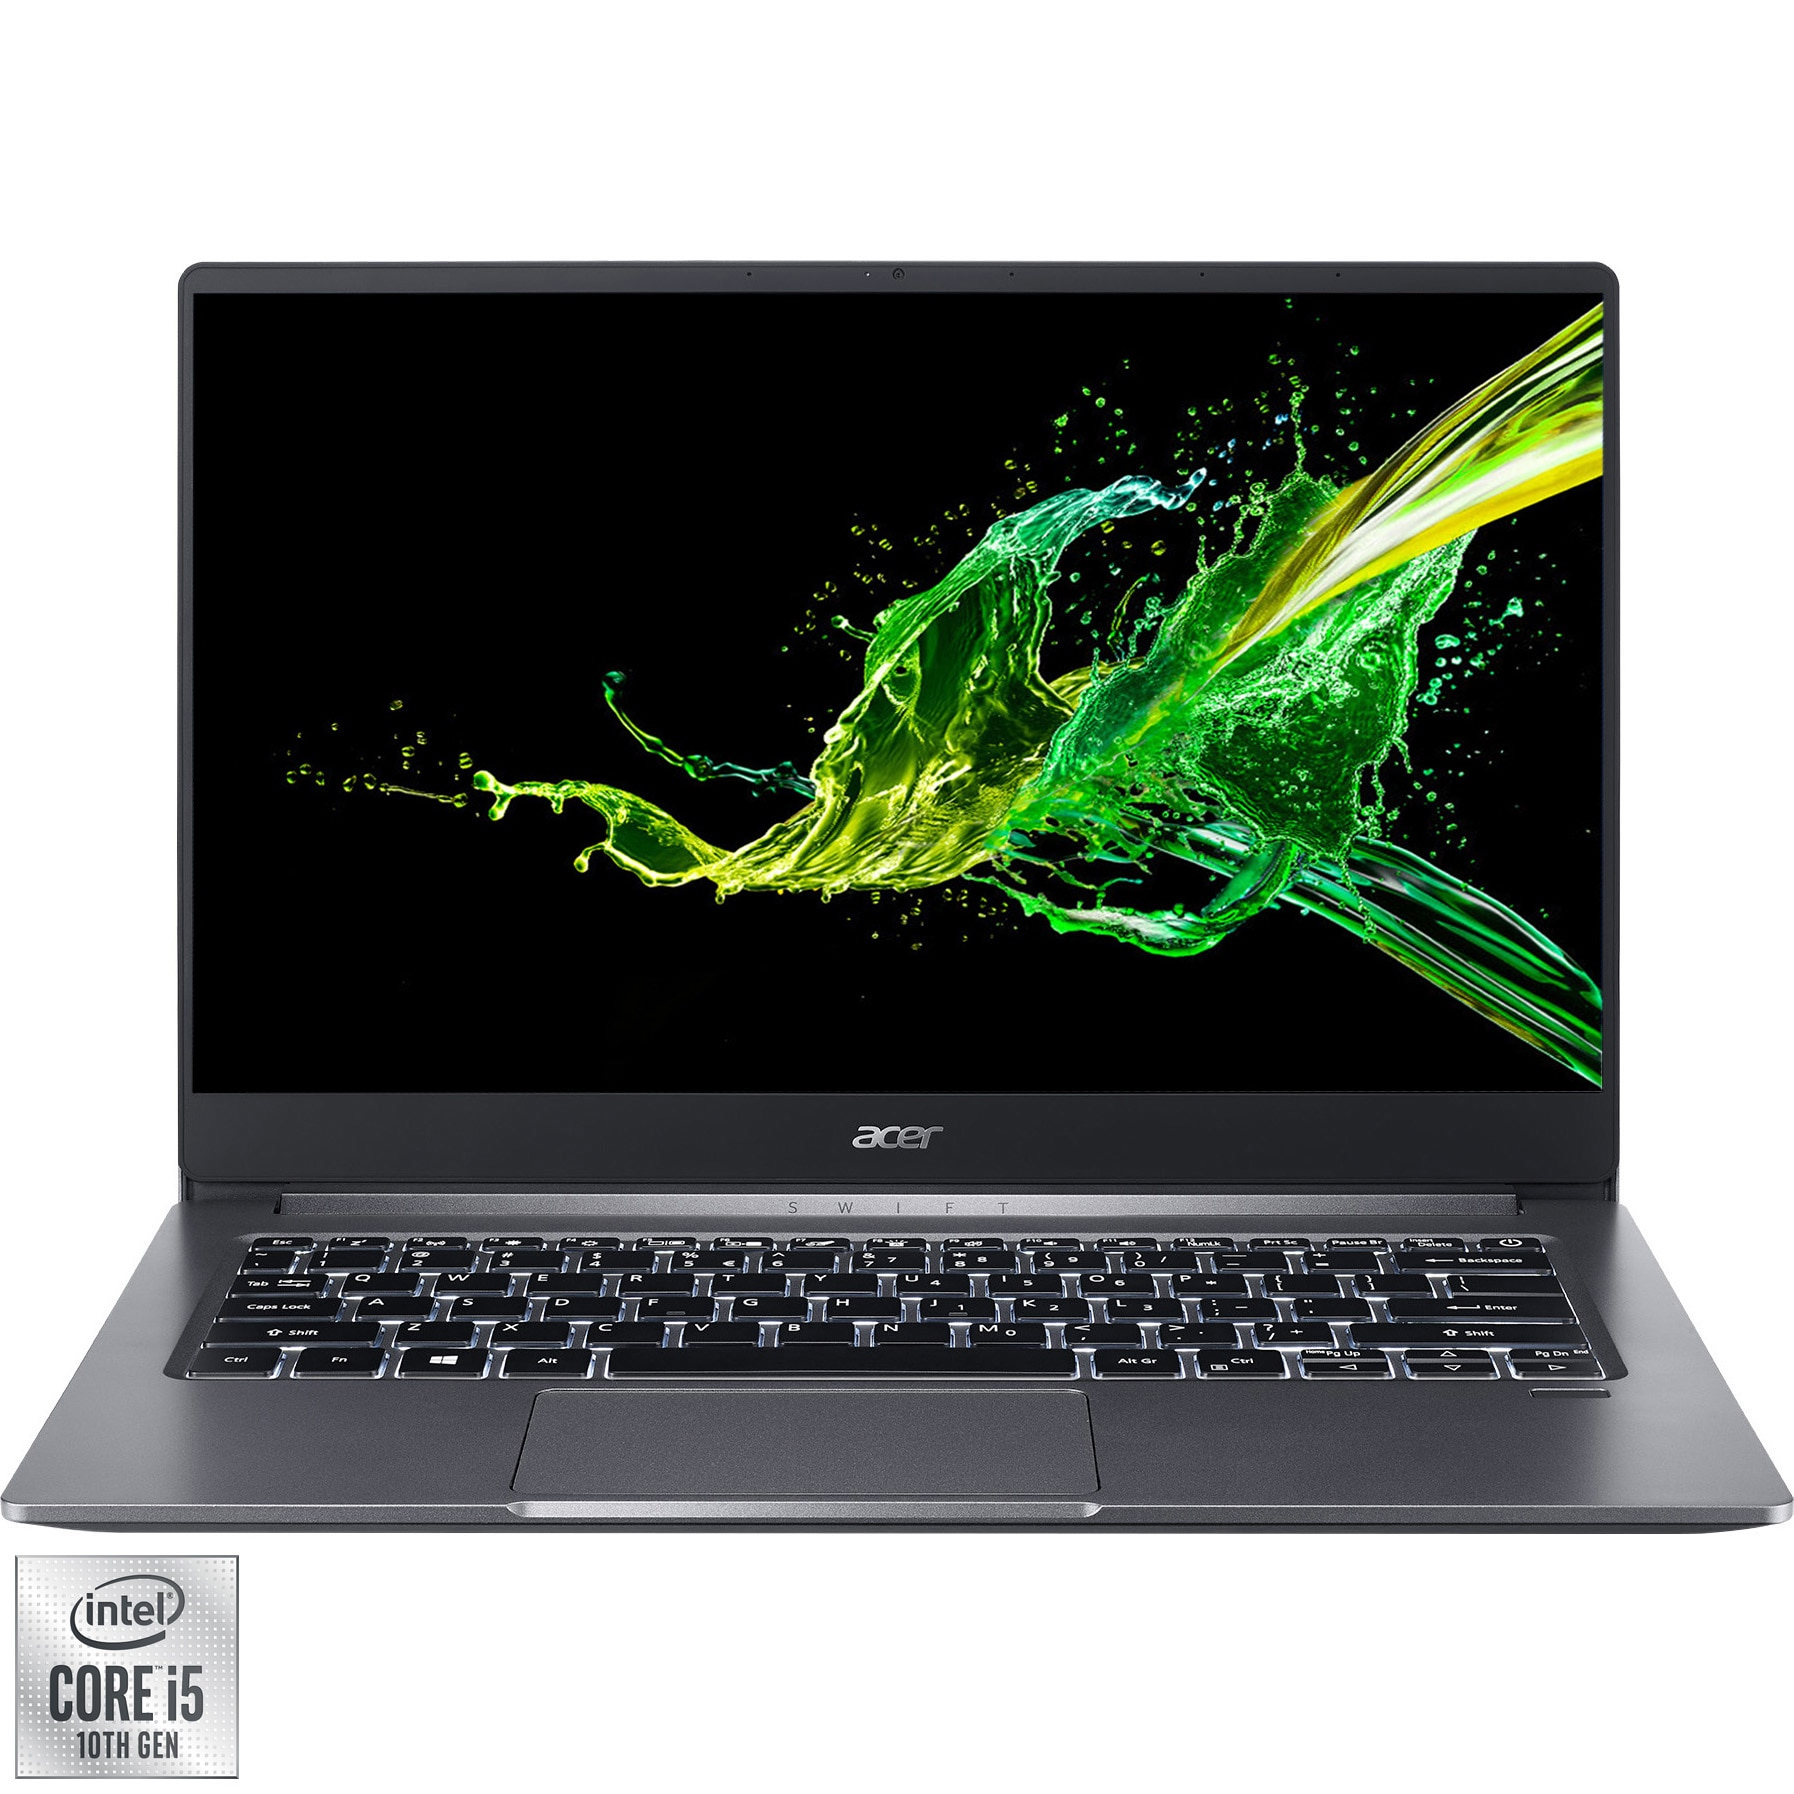 "Fotografie Laptop ultraportabil Acer Swift 3 SF314-57 cu procesor Intel core i5-1035G1 pana la 3.60 GHz, 14"", Full HD, 16GB, 256GB SSD, Intel UHD Graphics, No OS, Steel Grey"